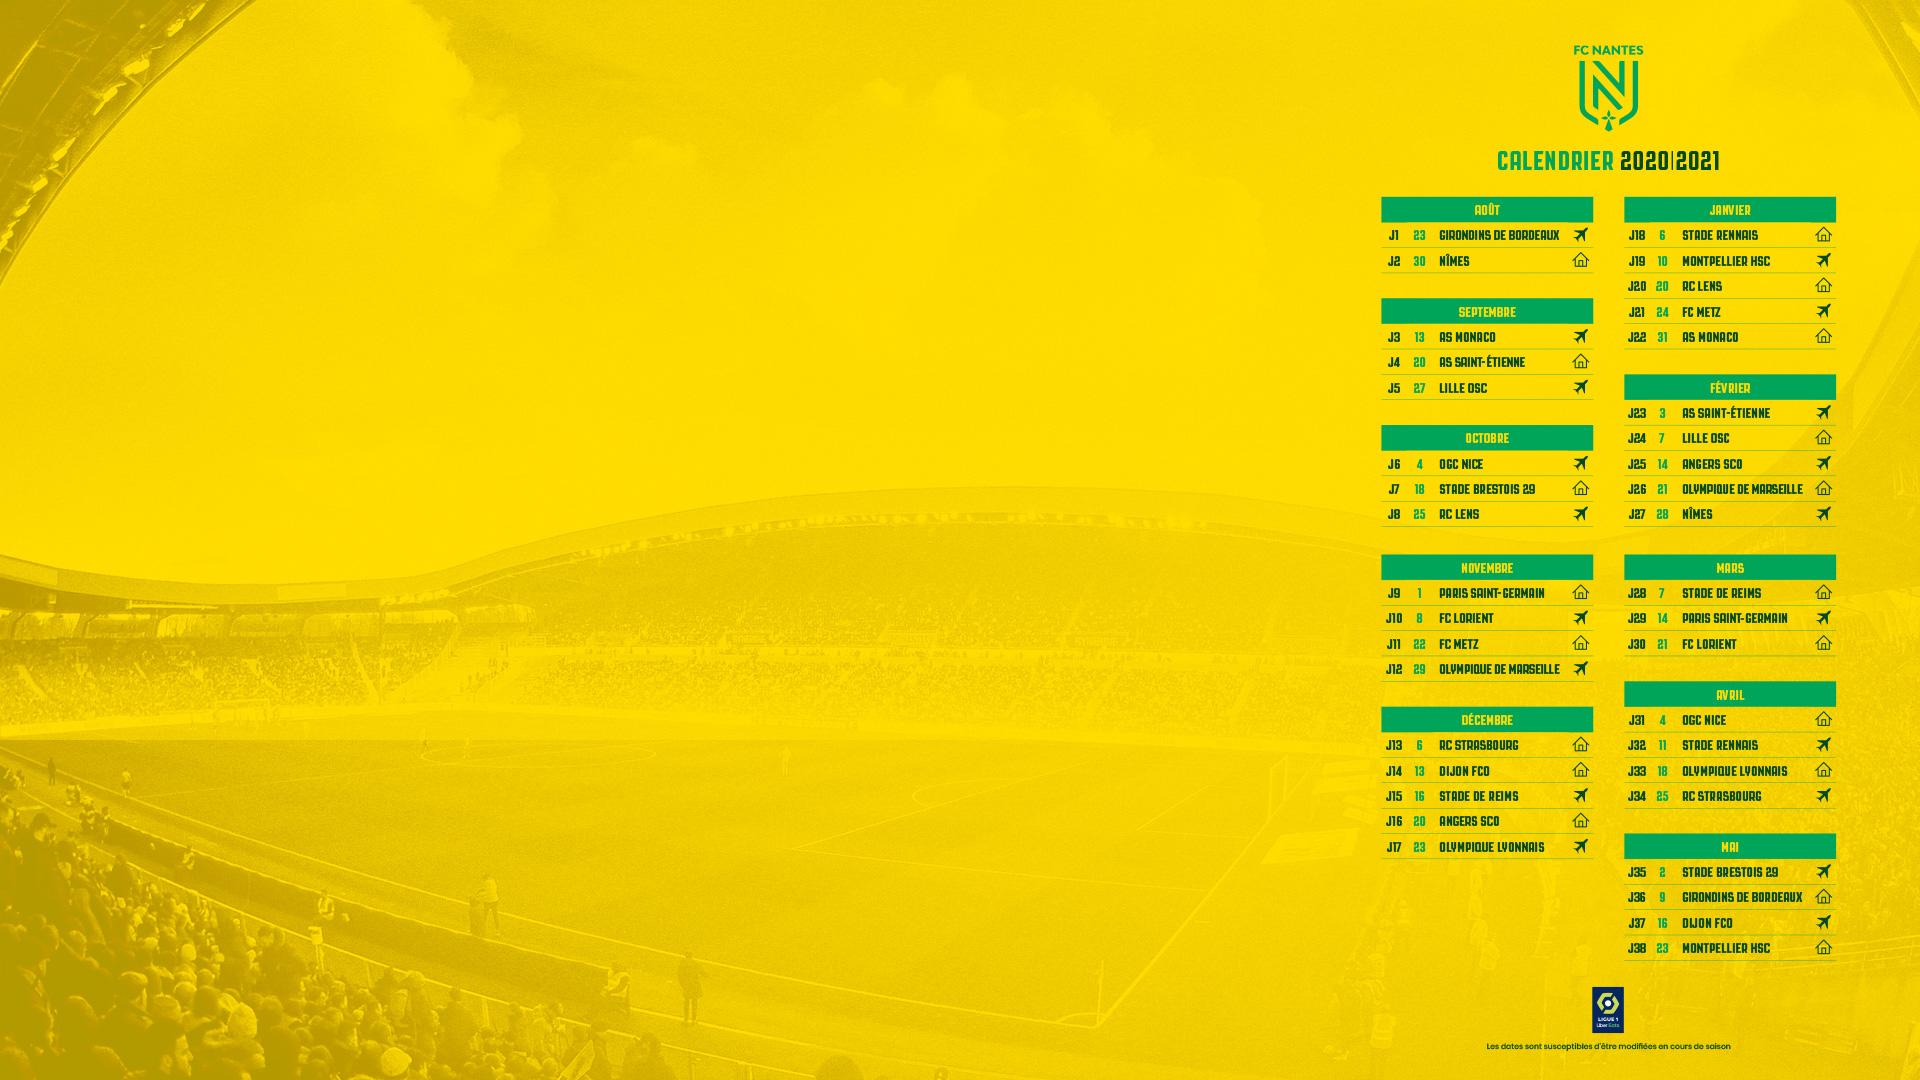 calendrier saison2020 | 2021